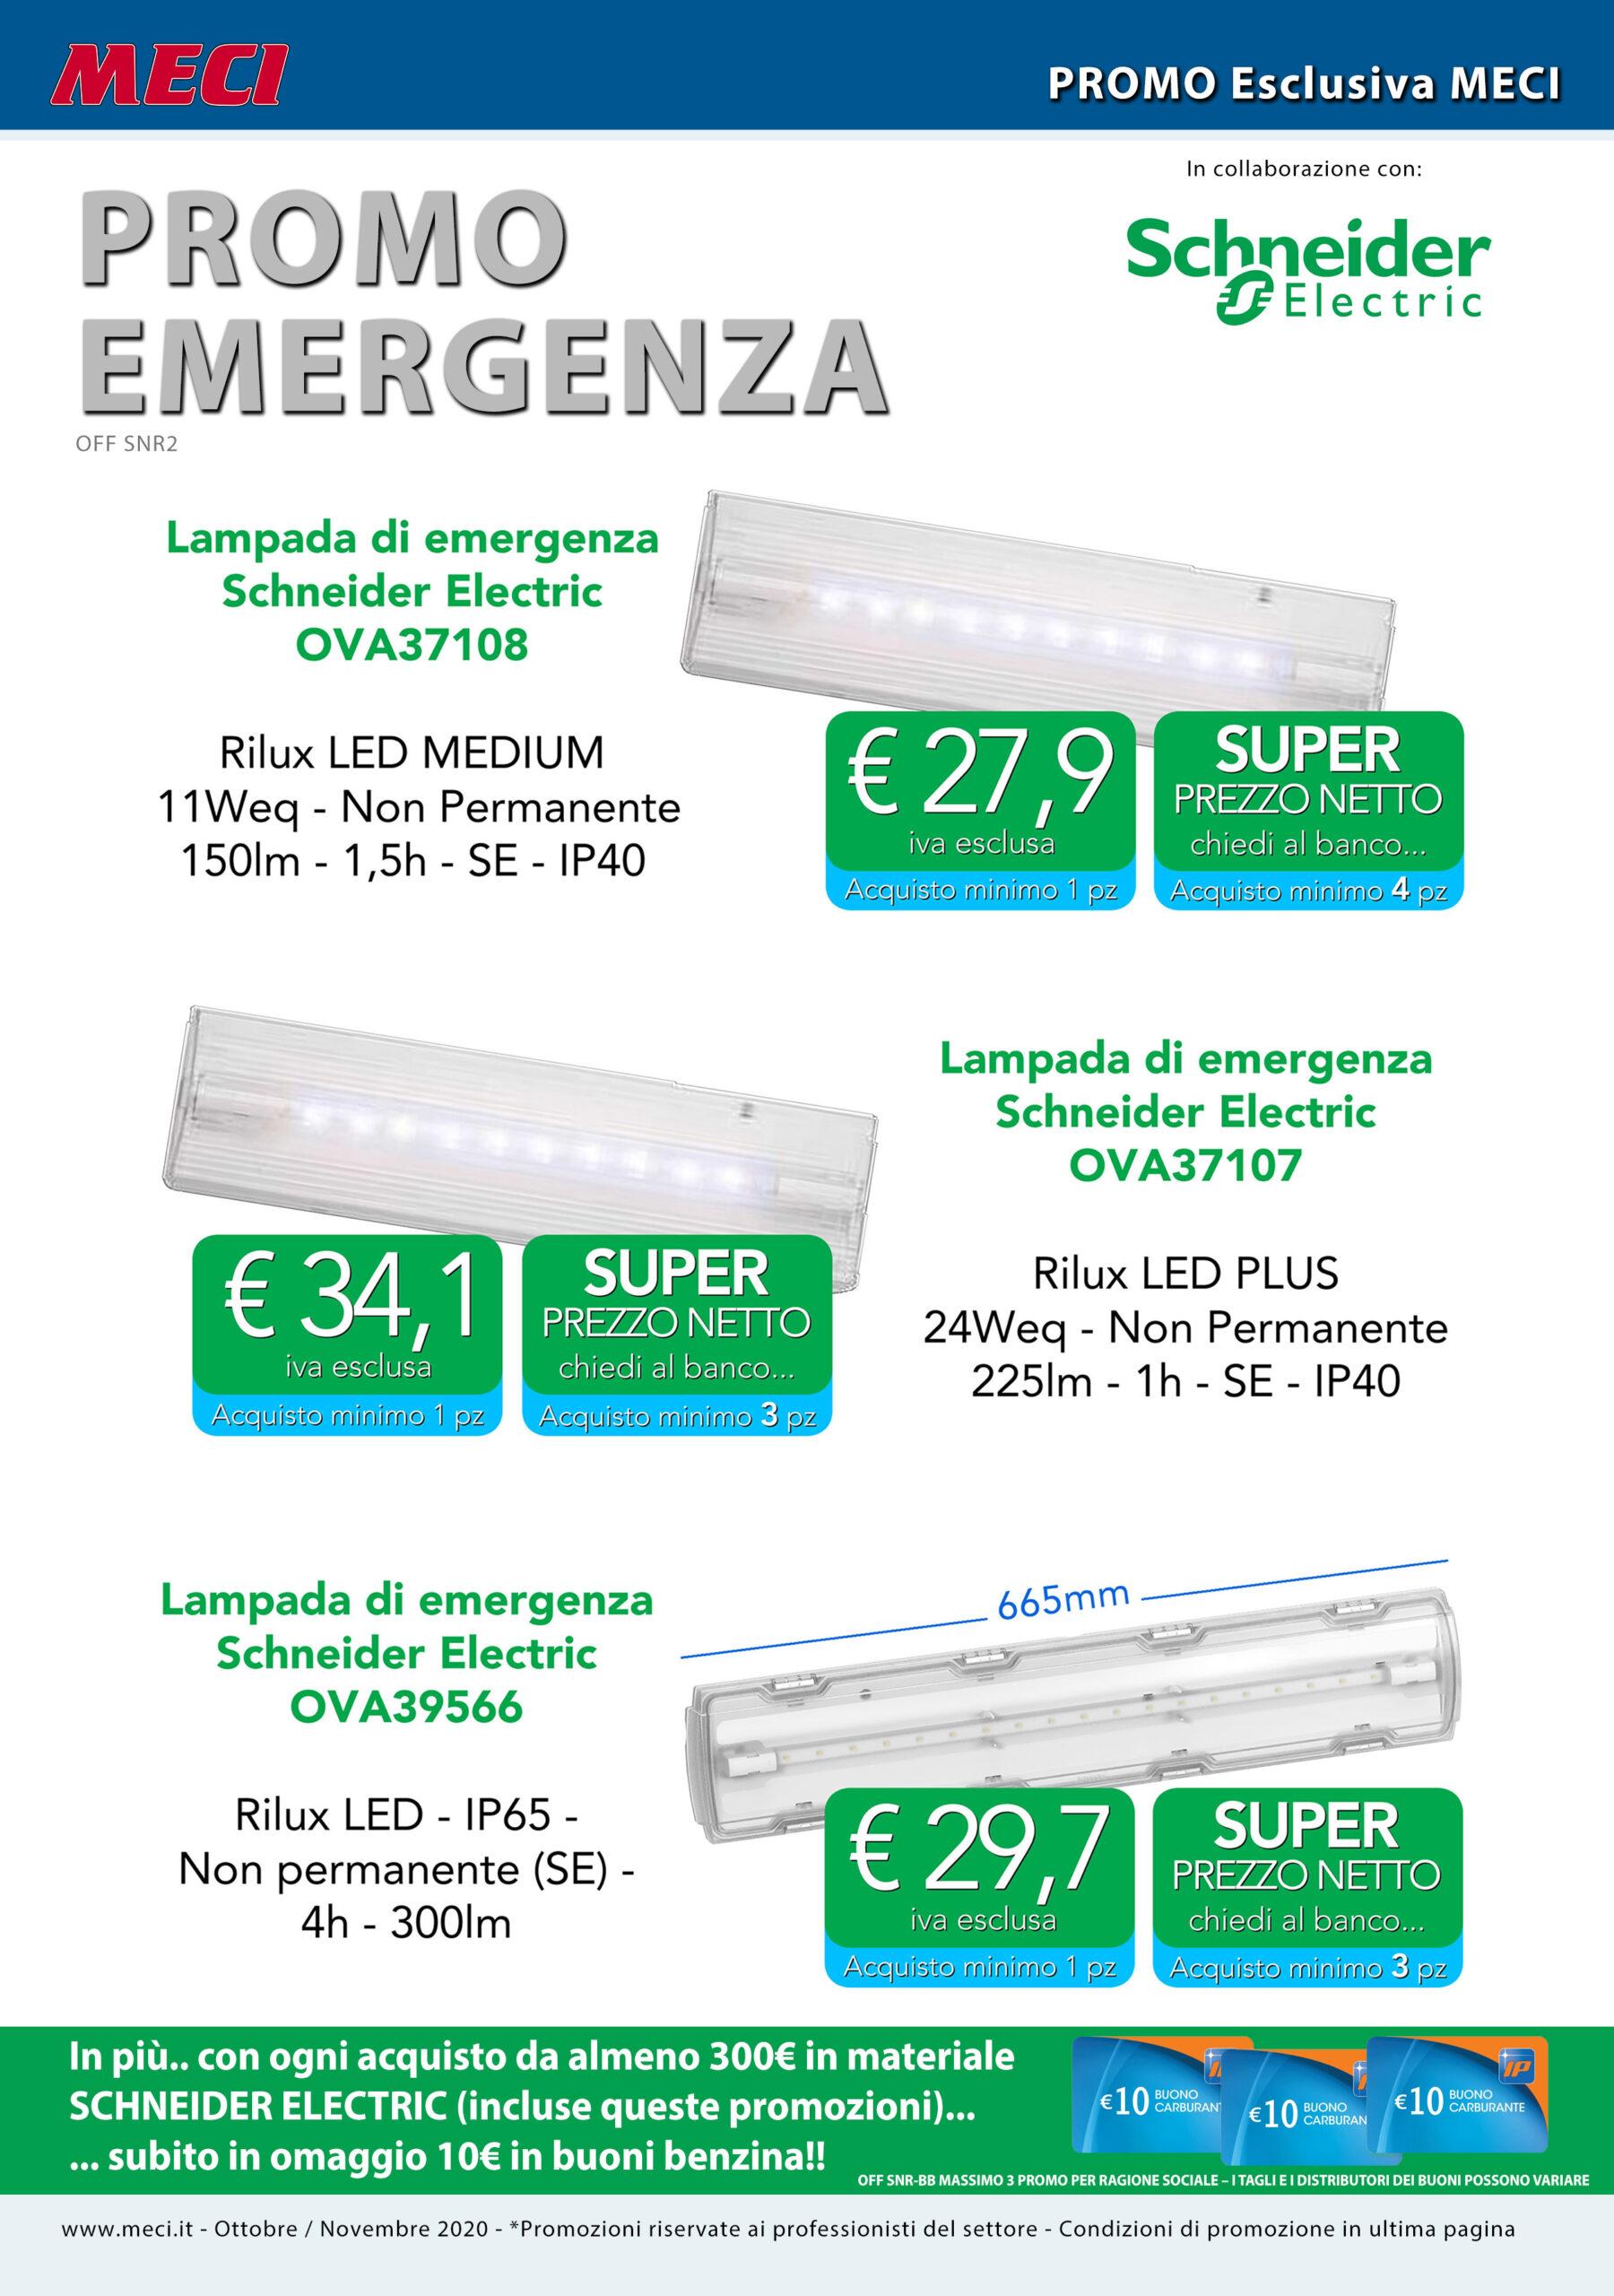 Promozione Emergenza Schneider Electric